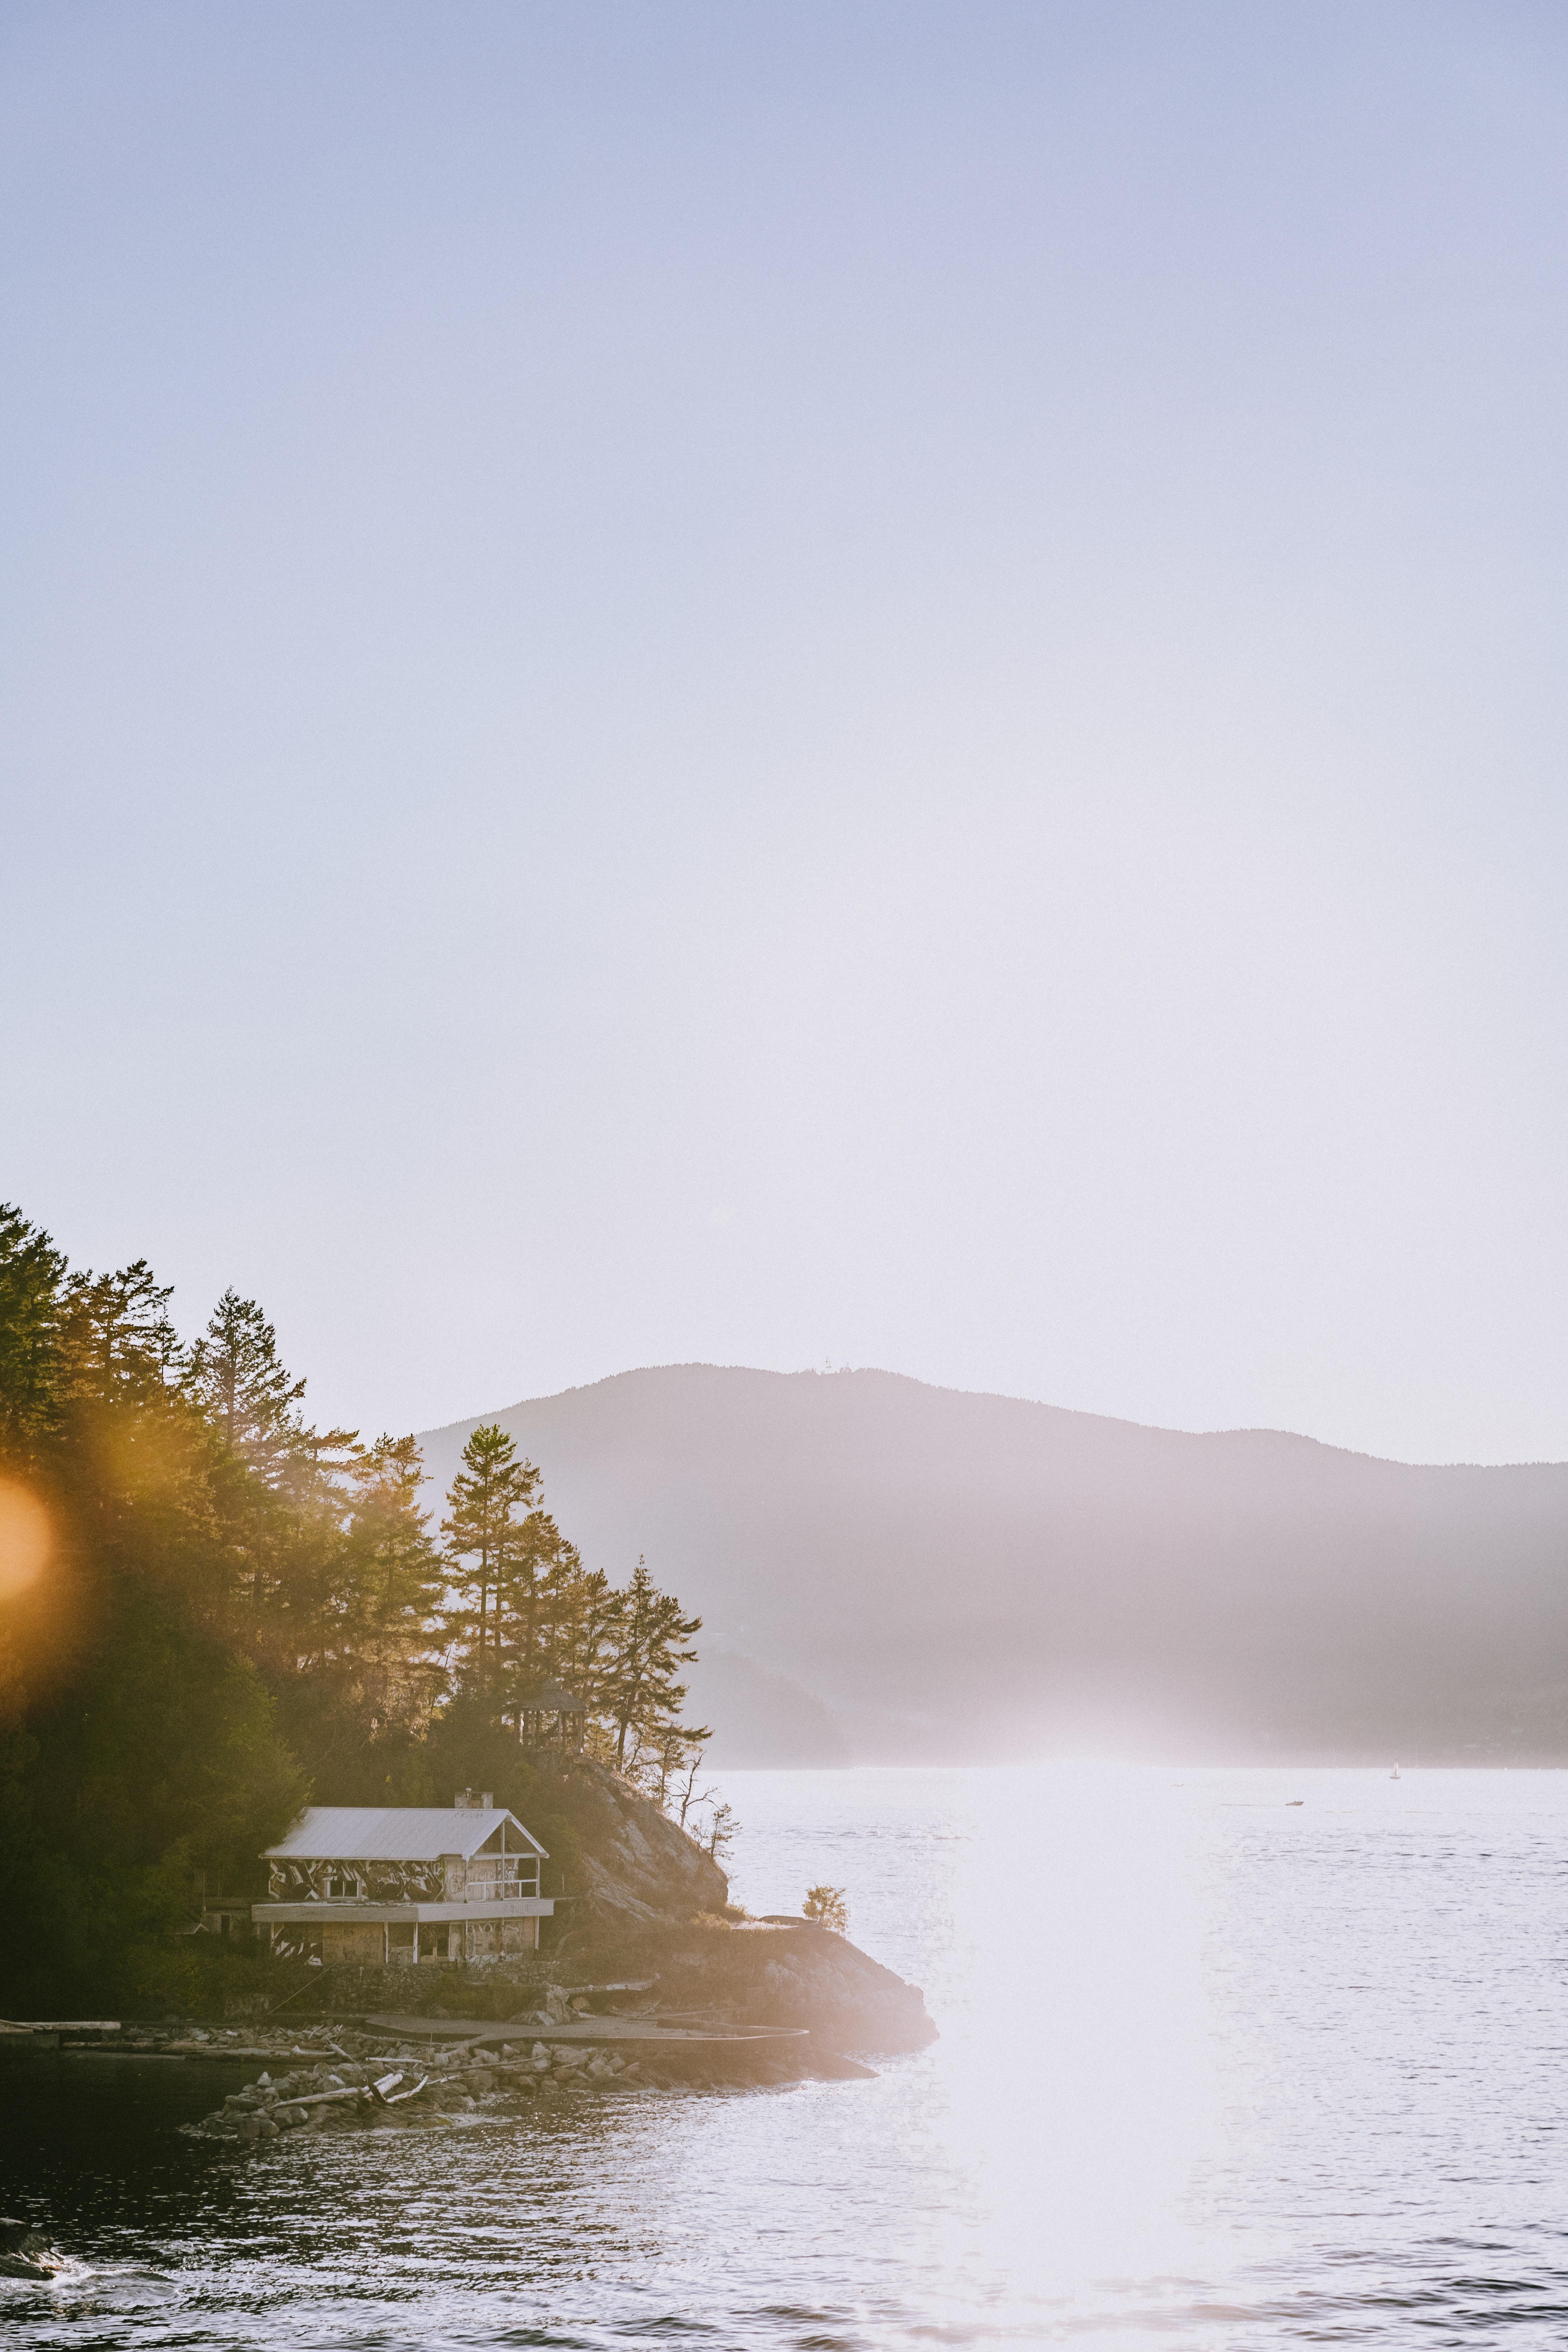 white cabin near body of water